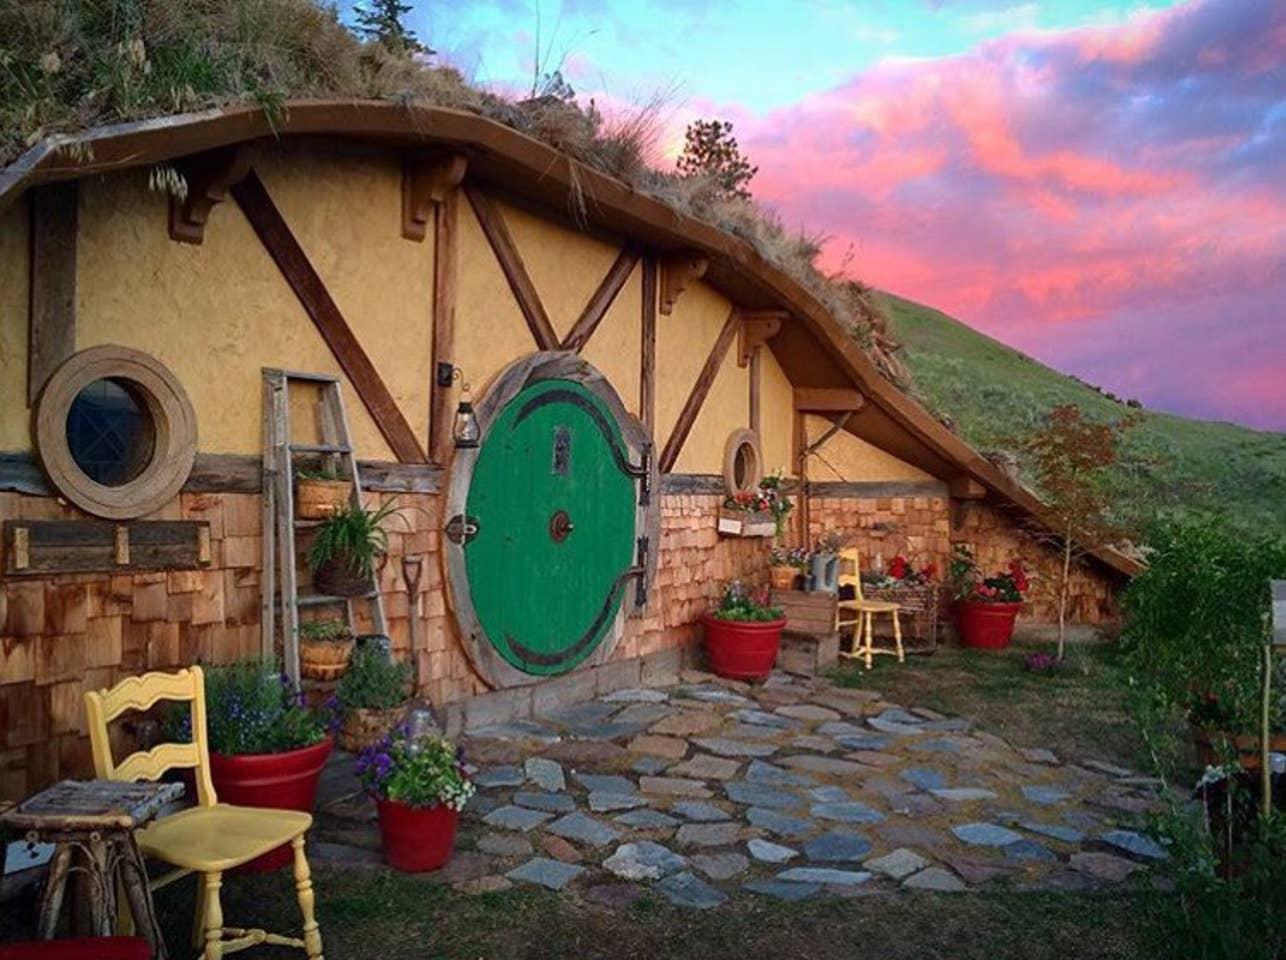 Hobbit House in Washington, US